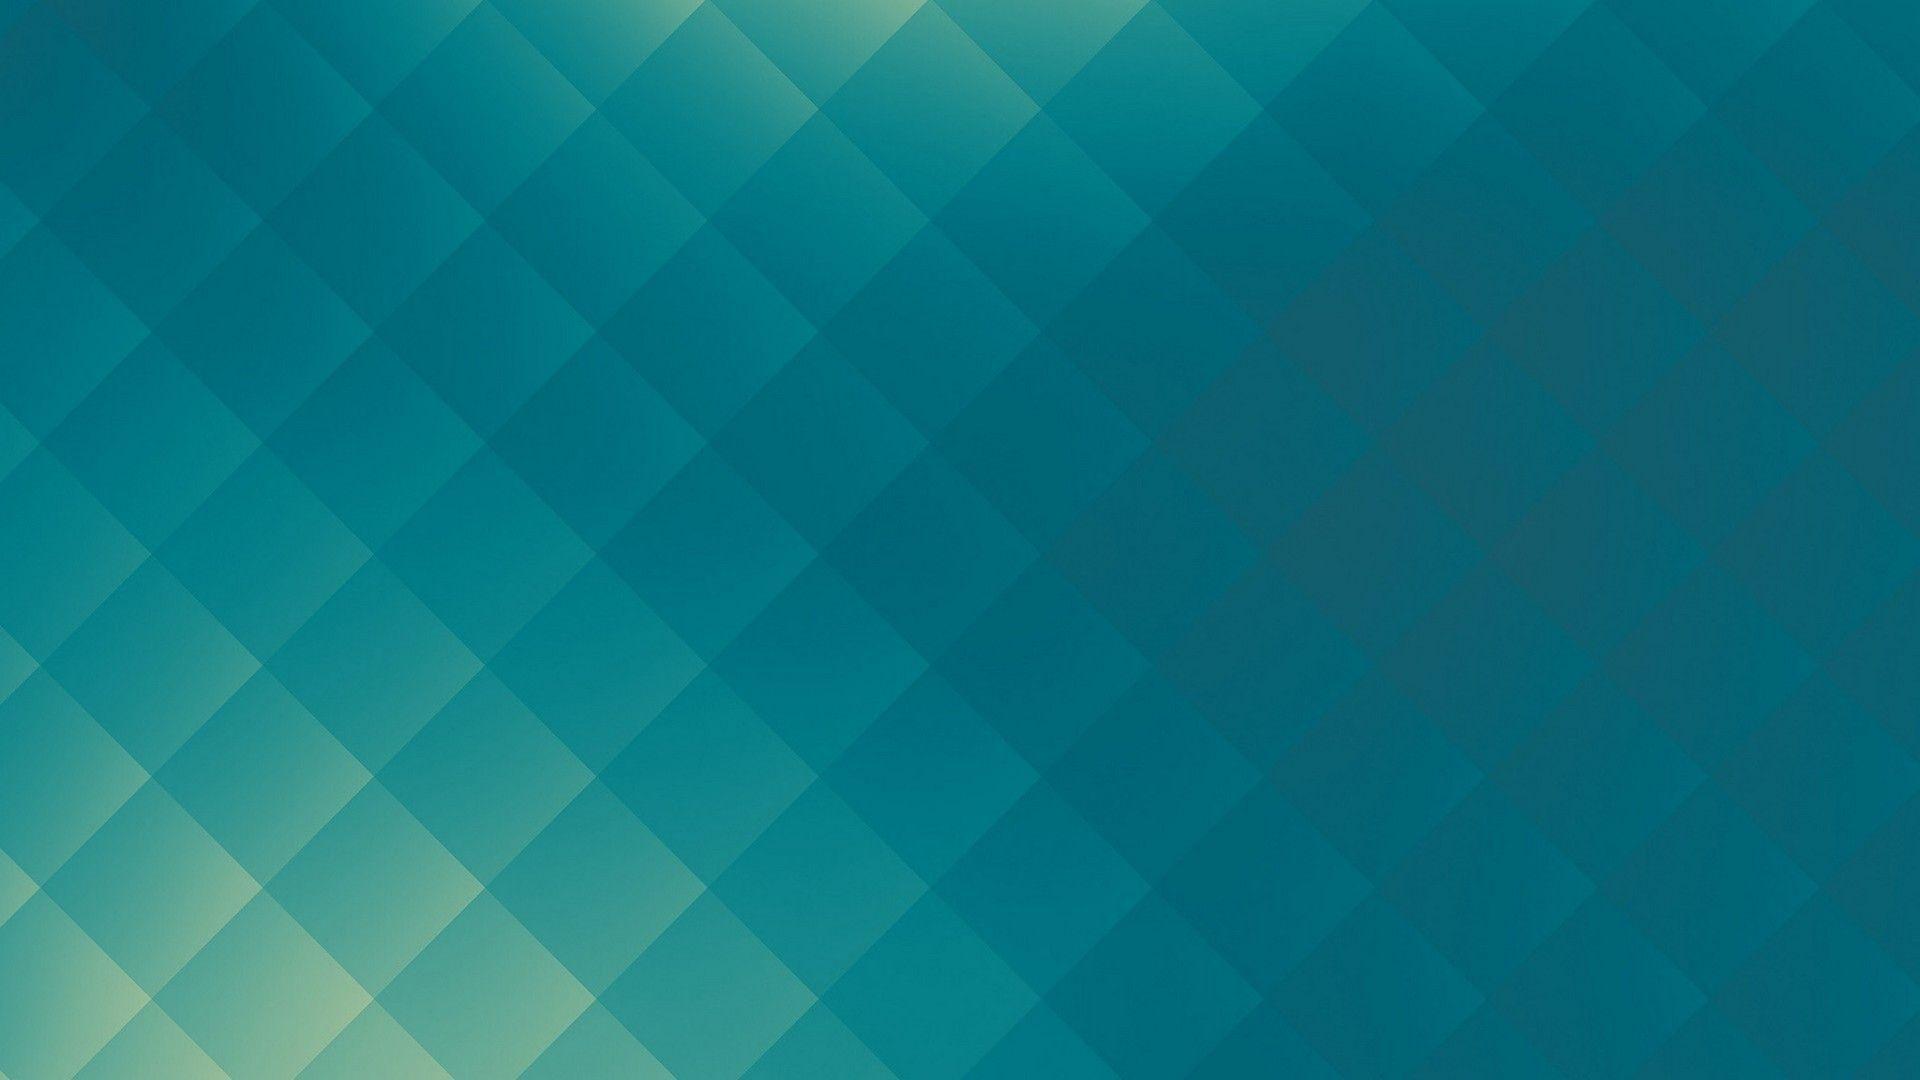 Teal Blue Desktop Backgrounds Hd Best Wallpaper Hd Digital Wallpaper Black And Blue Wallpaper Abstract